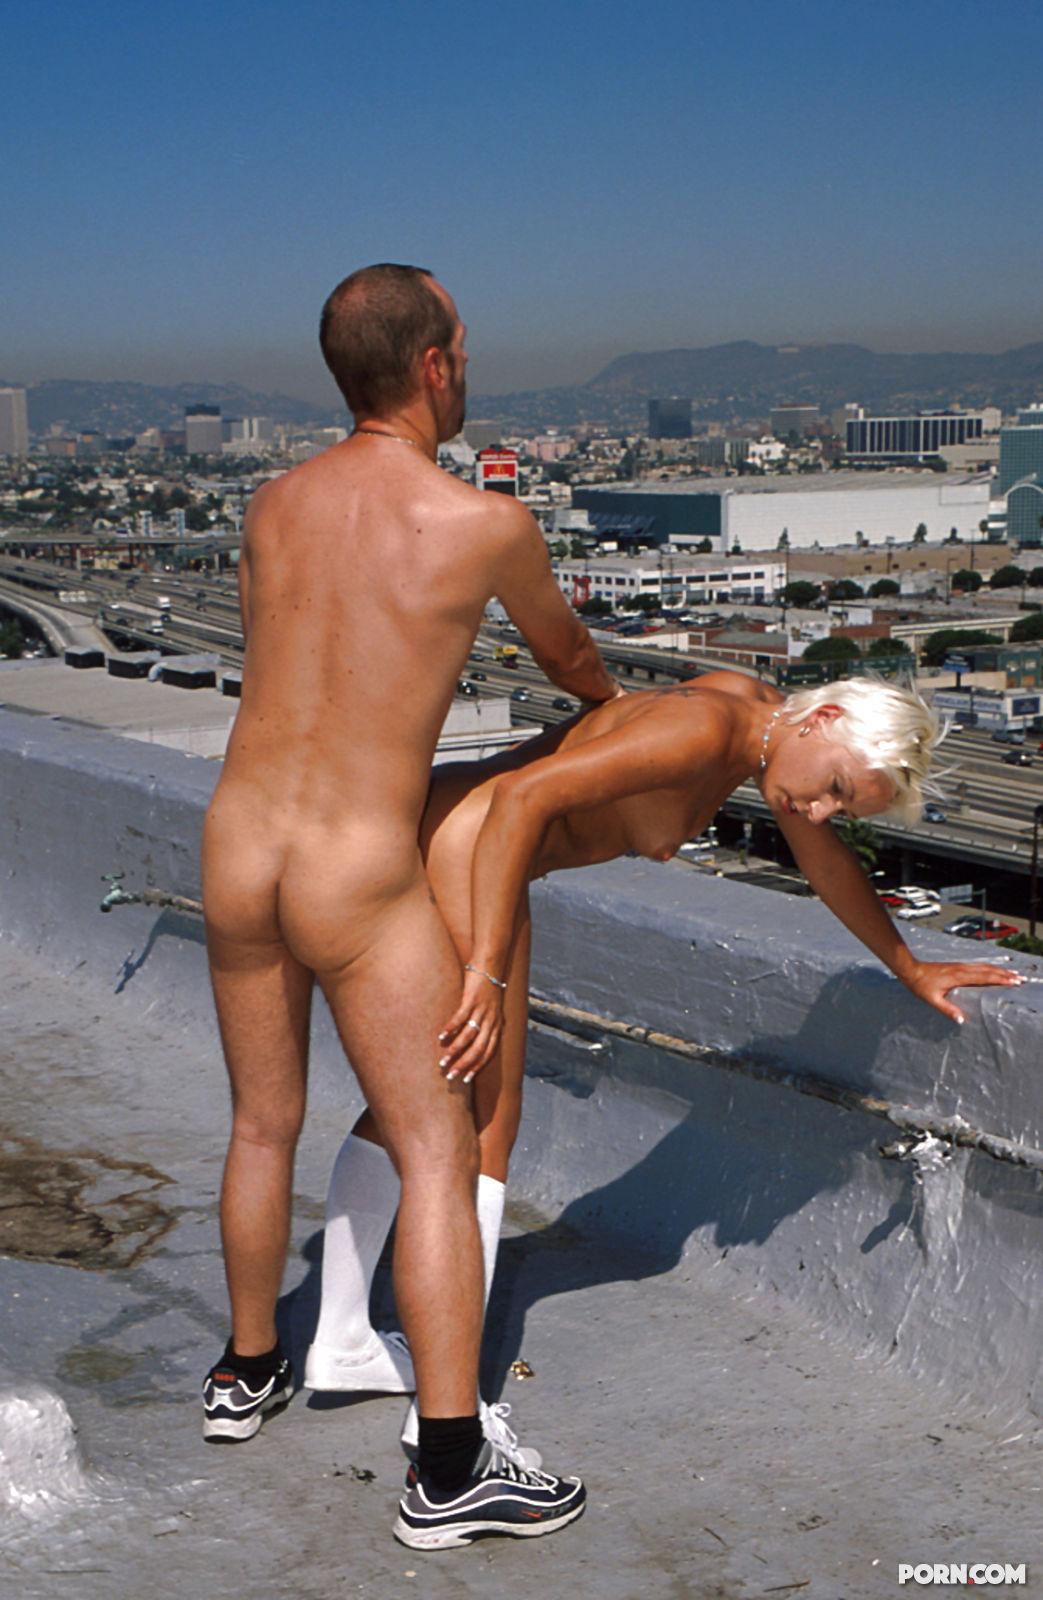 Секс на корыше 10 фотография